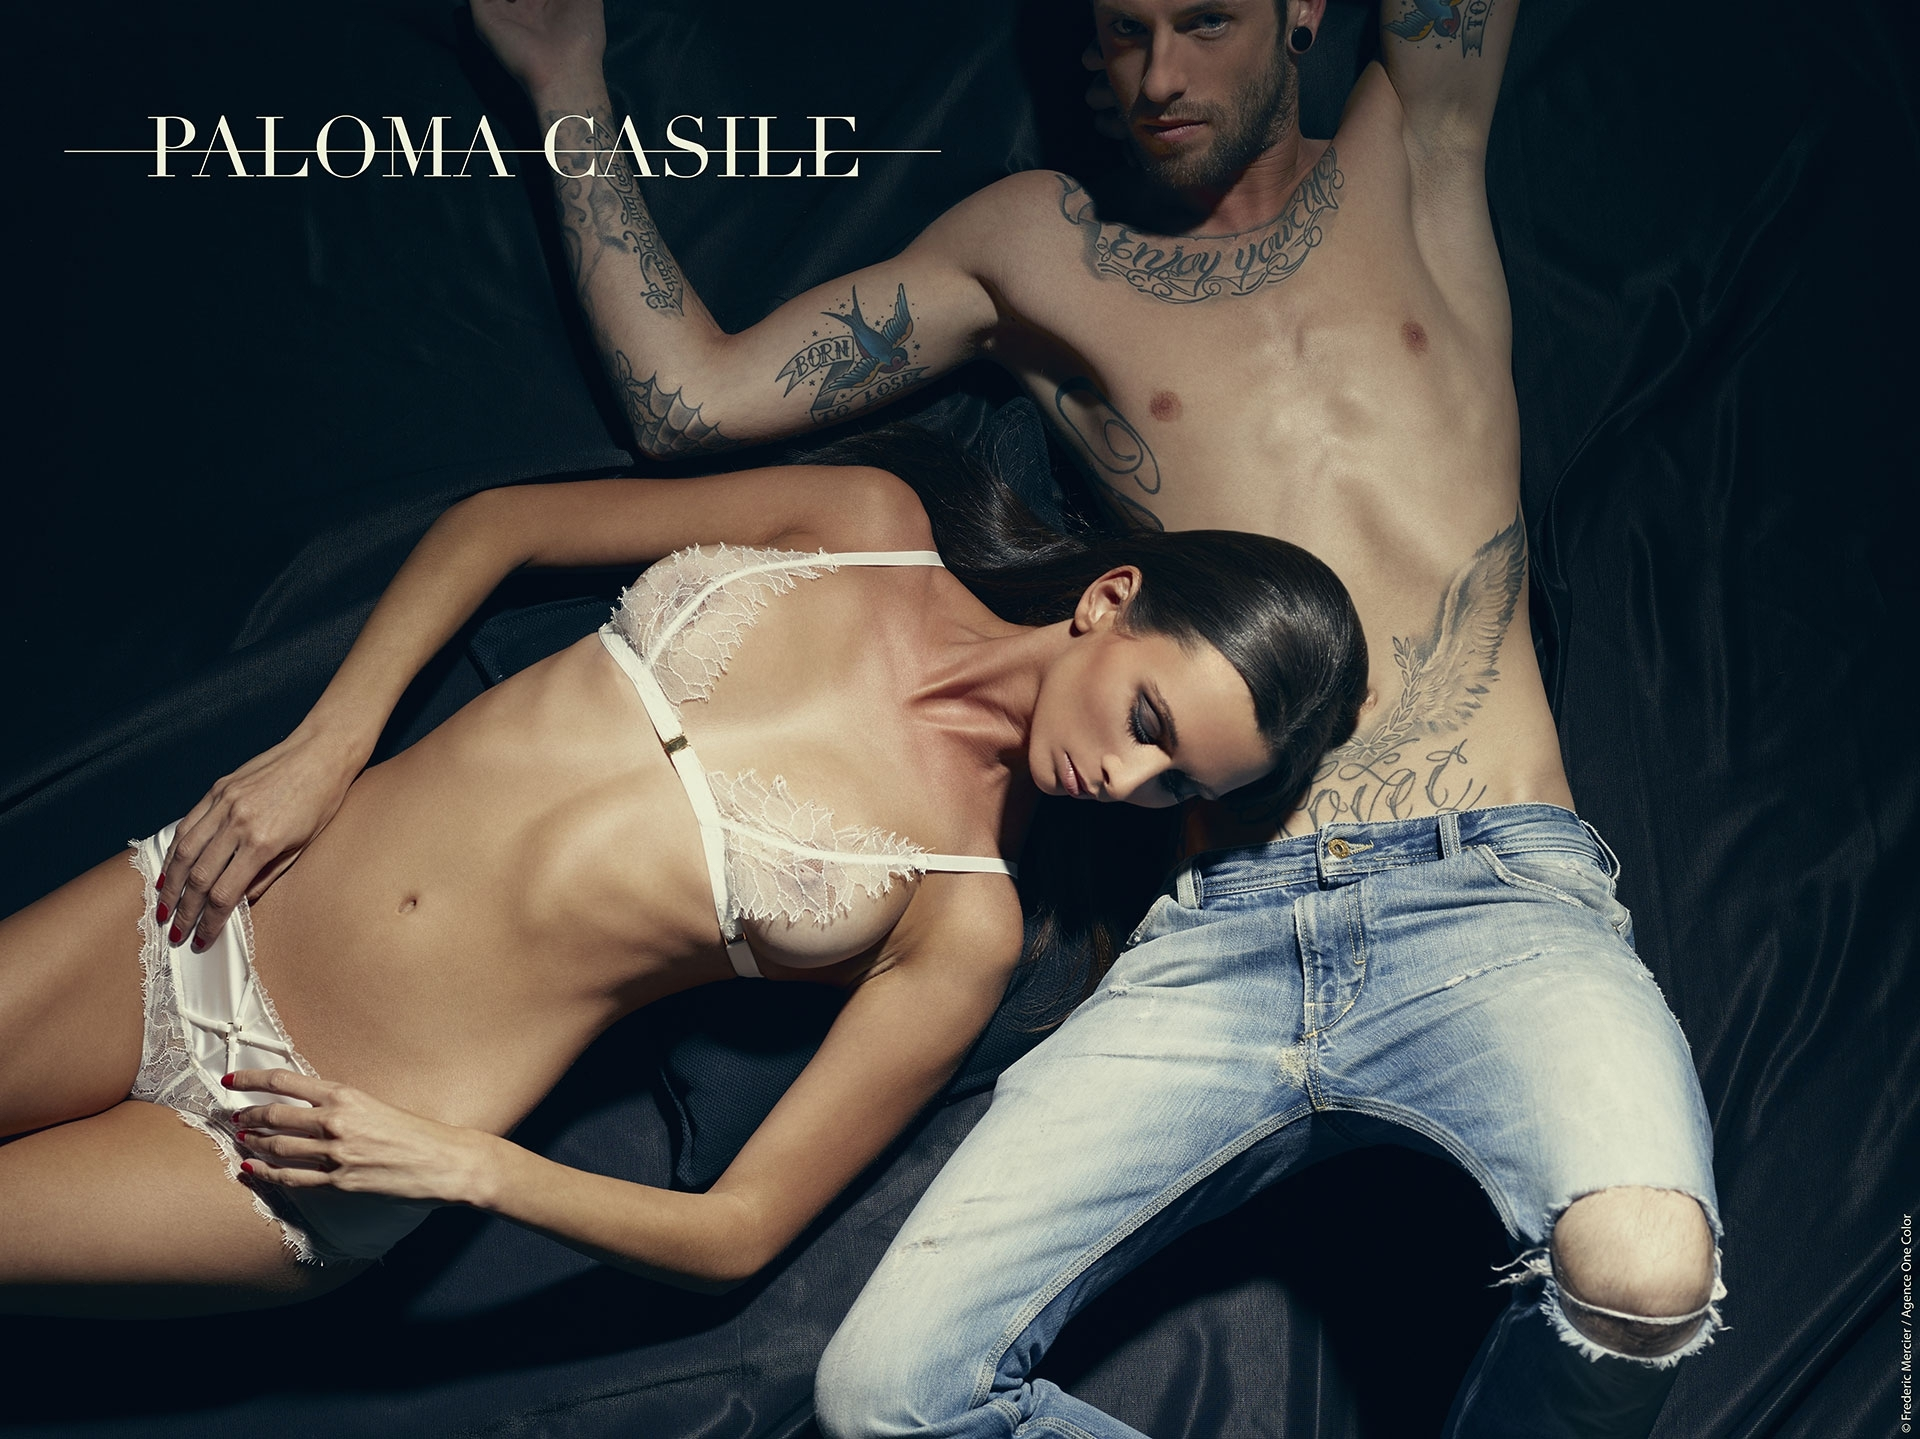 paloma casile ss 2014 campaign lingerie underwear frederic mercier fashion photographer one color